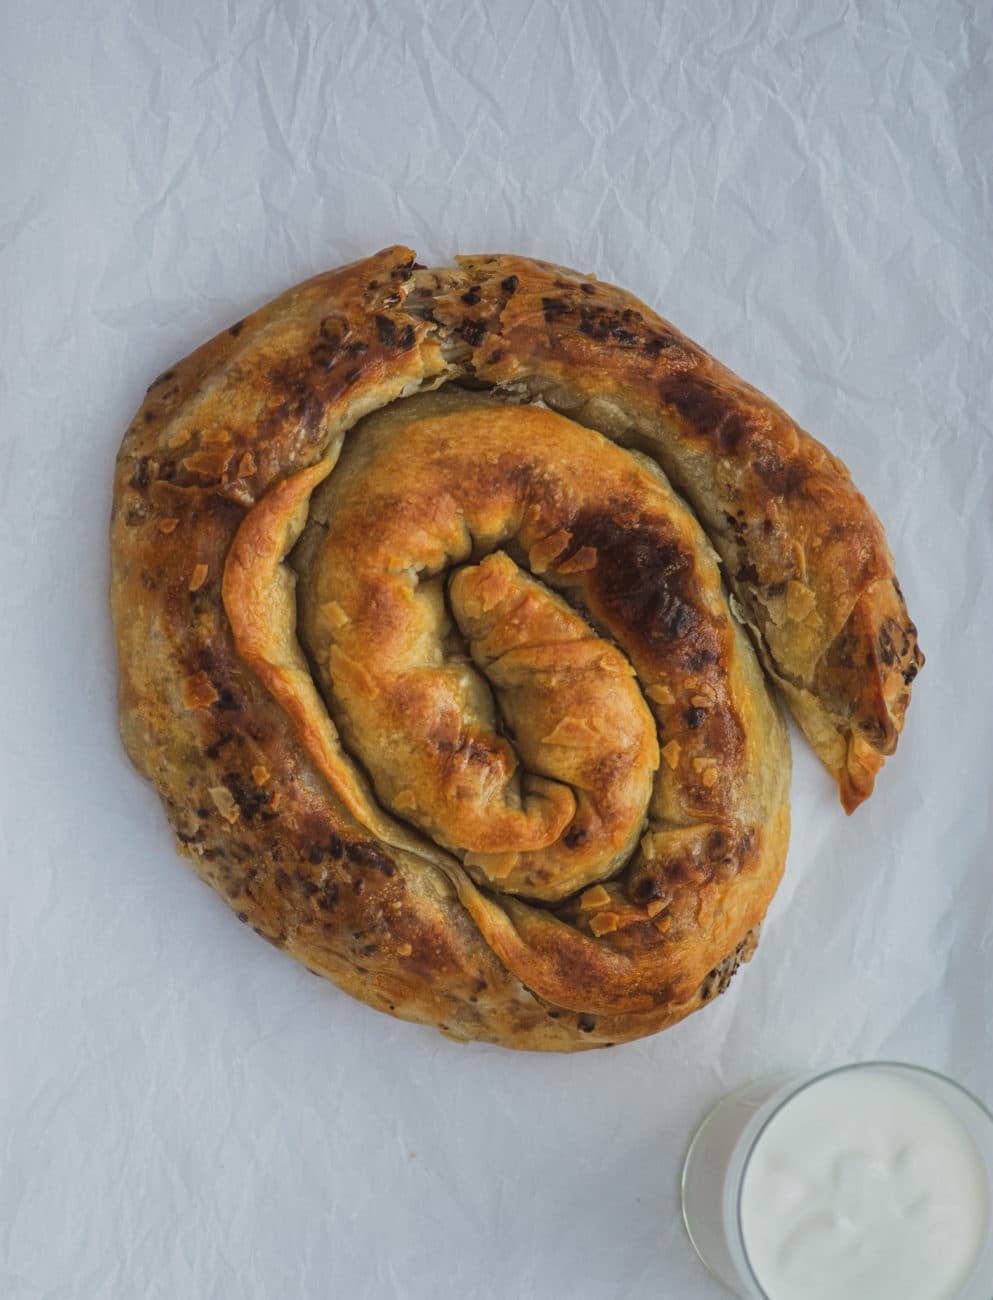 Burek Recipe: Making The Bosnian Version Of The Turkish Snack